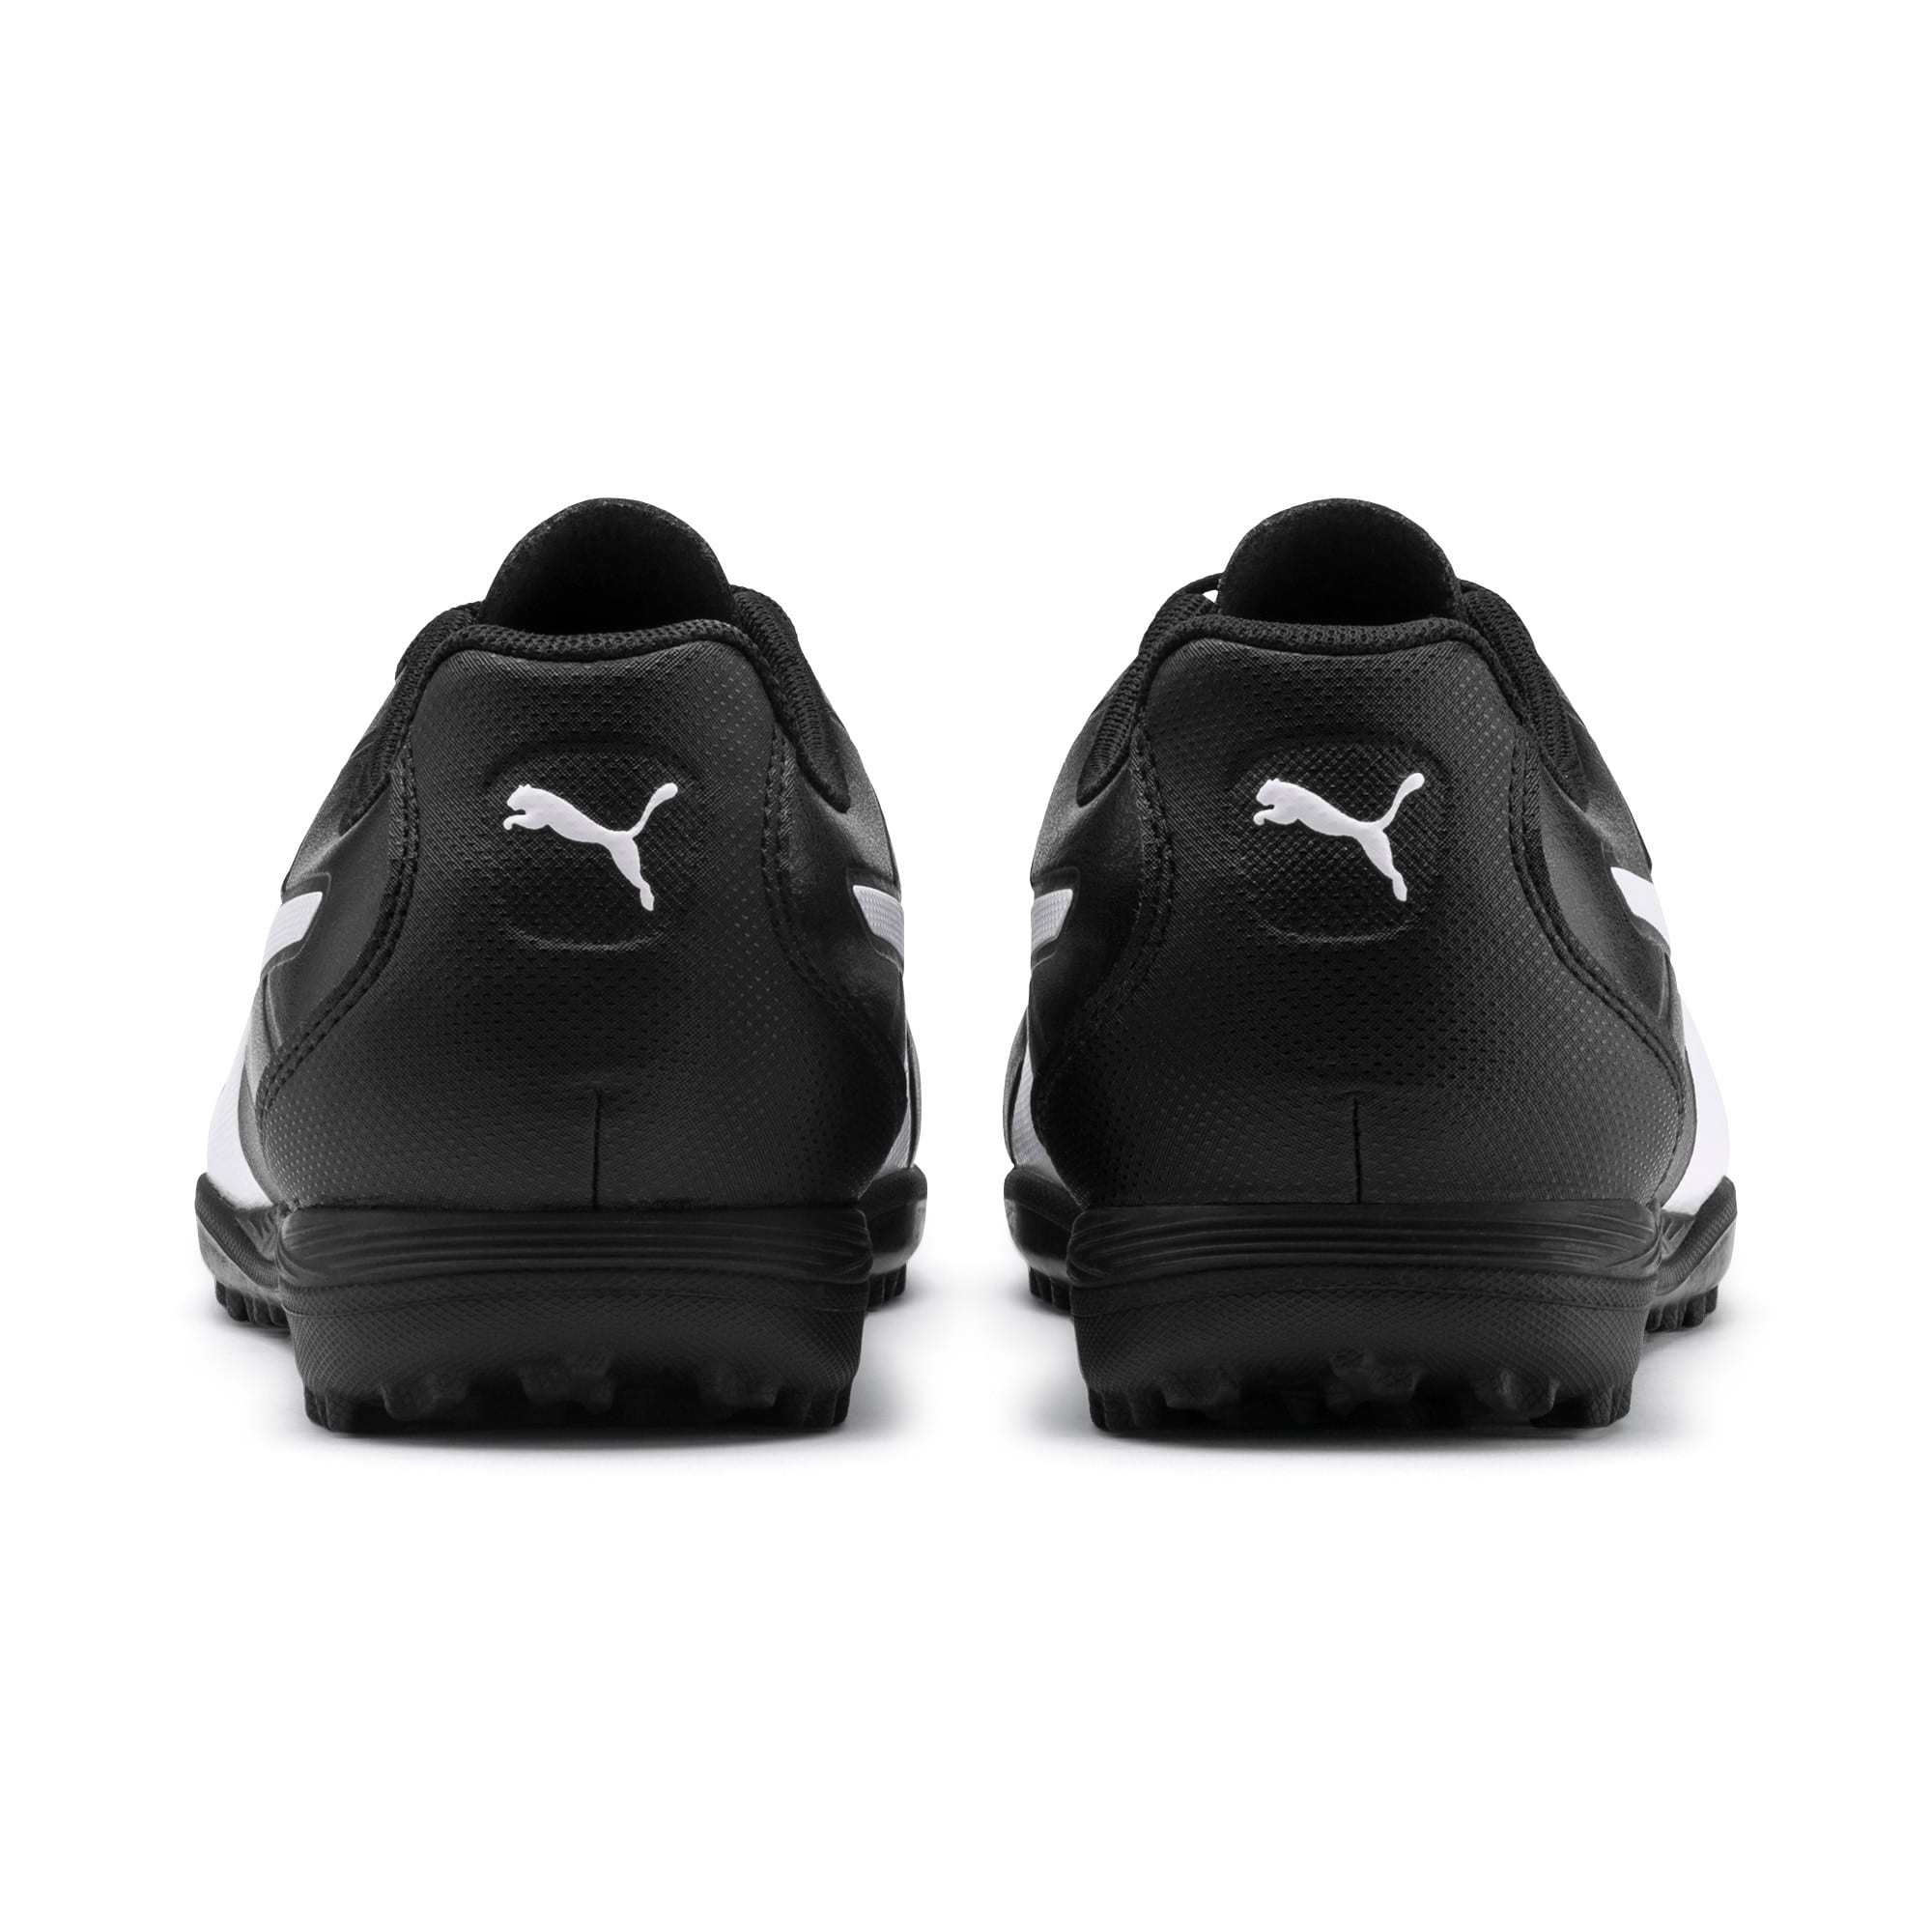 Thumbnail 3 of Monarch TT Youth Football Boots, Puma Black-Puma White, medium